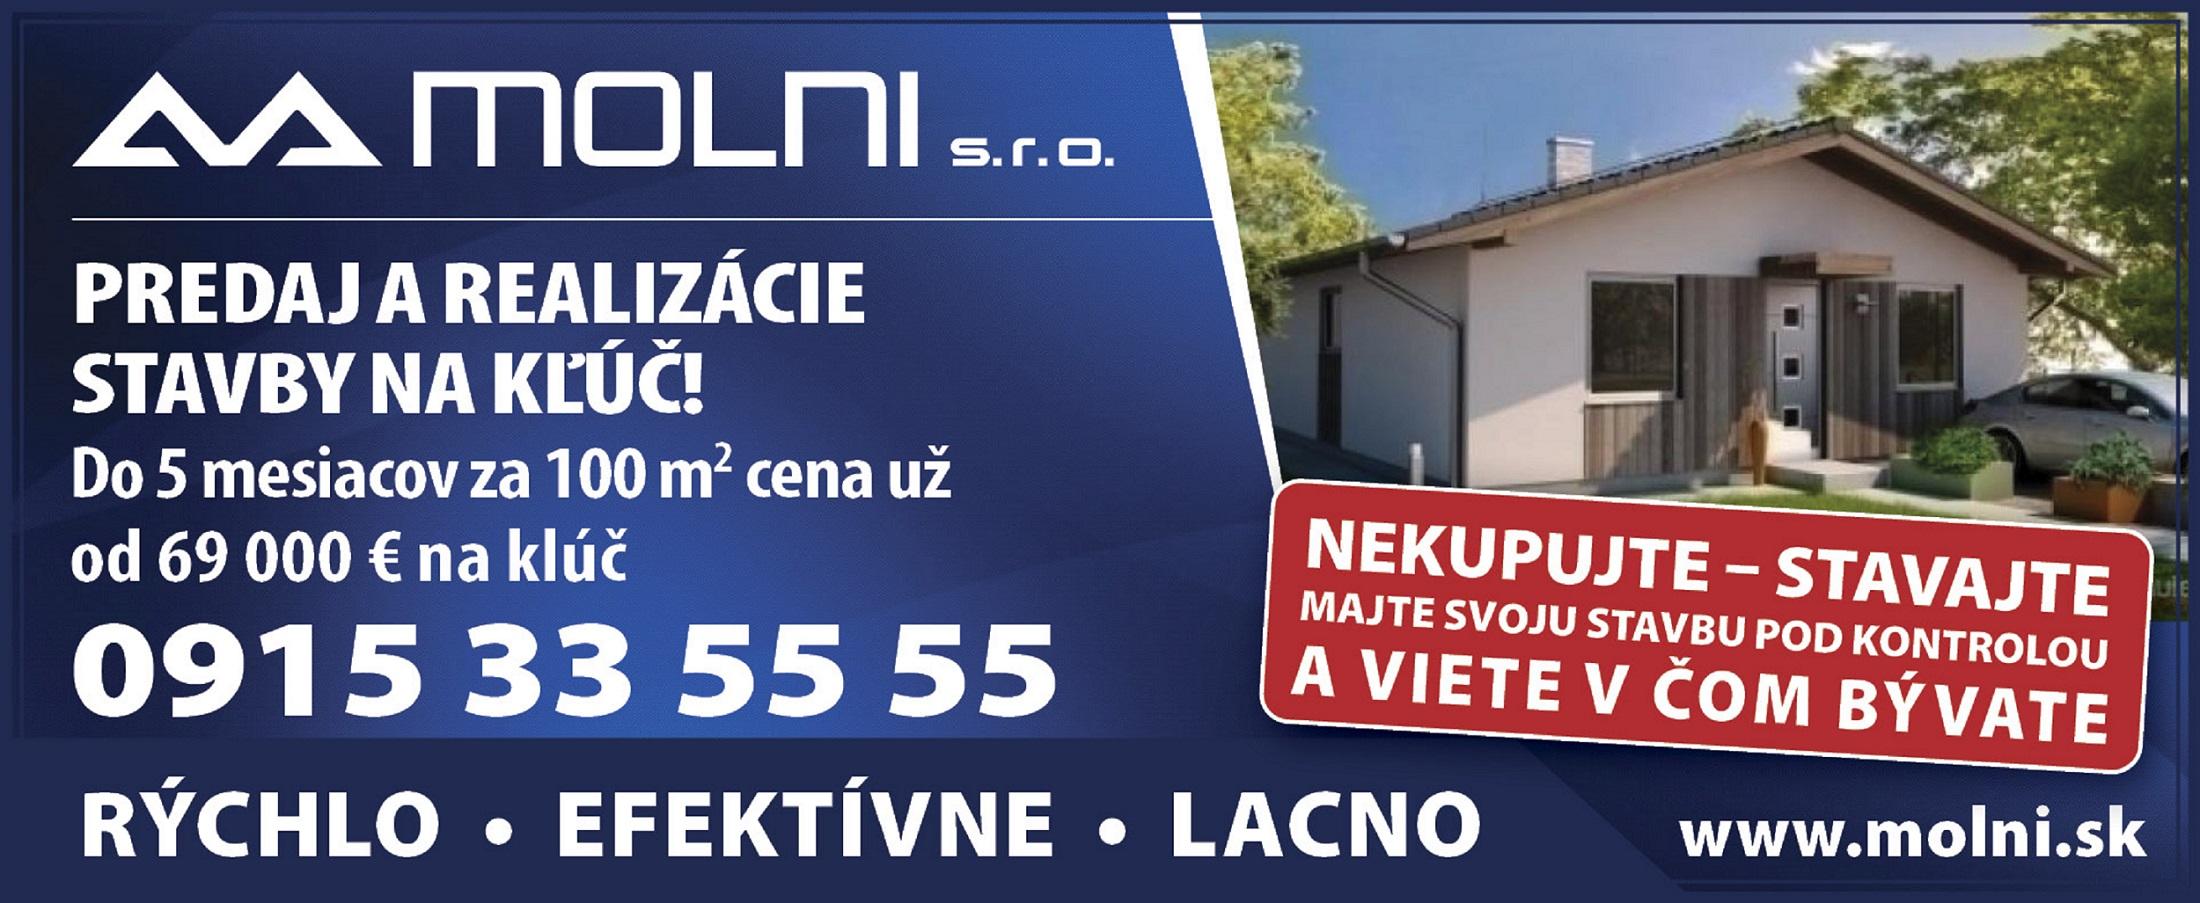 Molni.sk